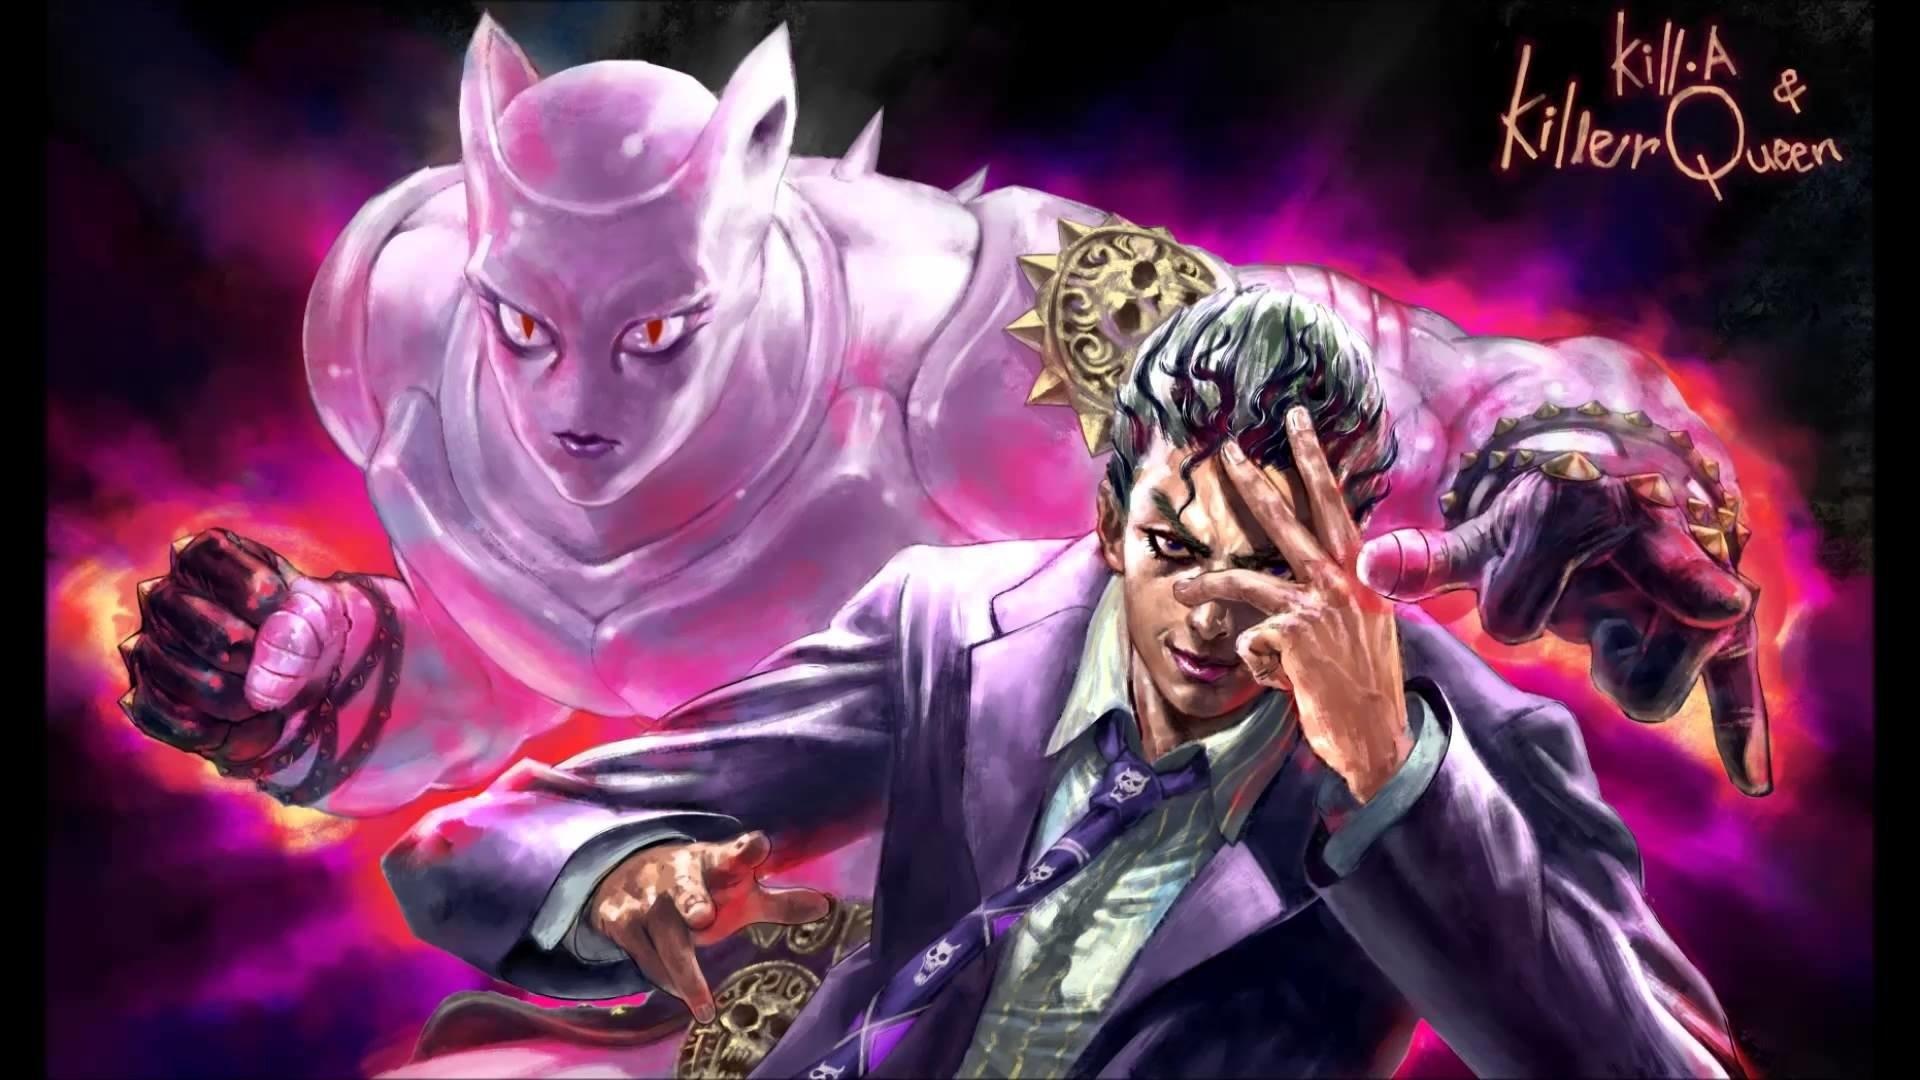 Anime – Jojo's Bizarre Adventure Kosaku Kawajiri Yoshikage Kira Killer  Queen (Jojo's Bizarre Adventure)